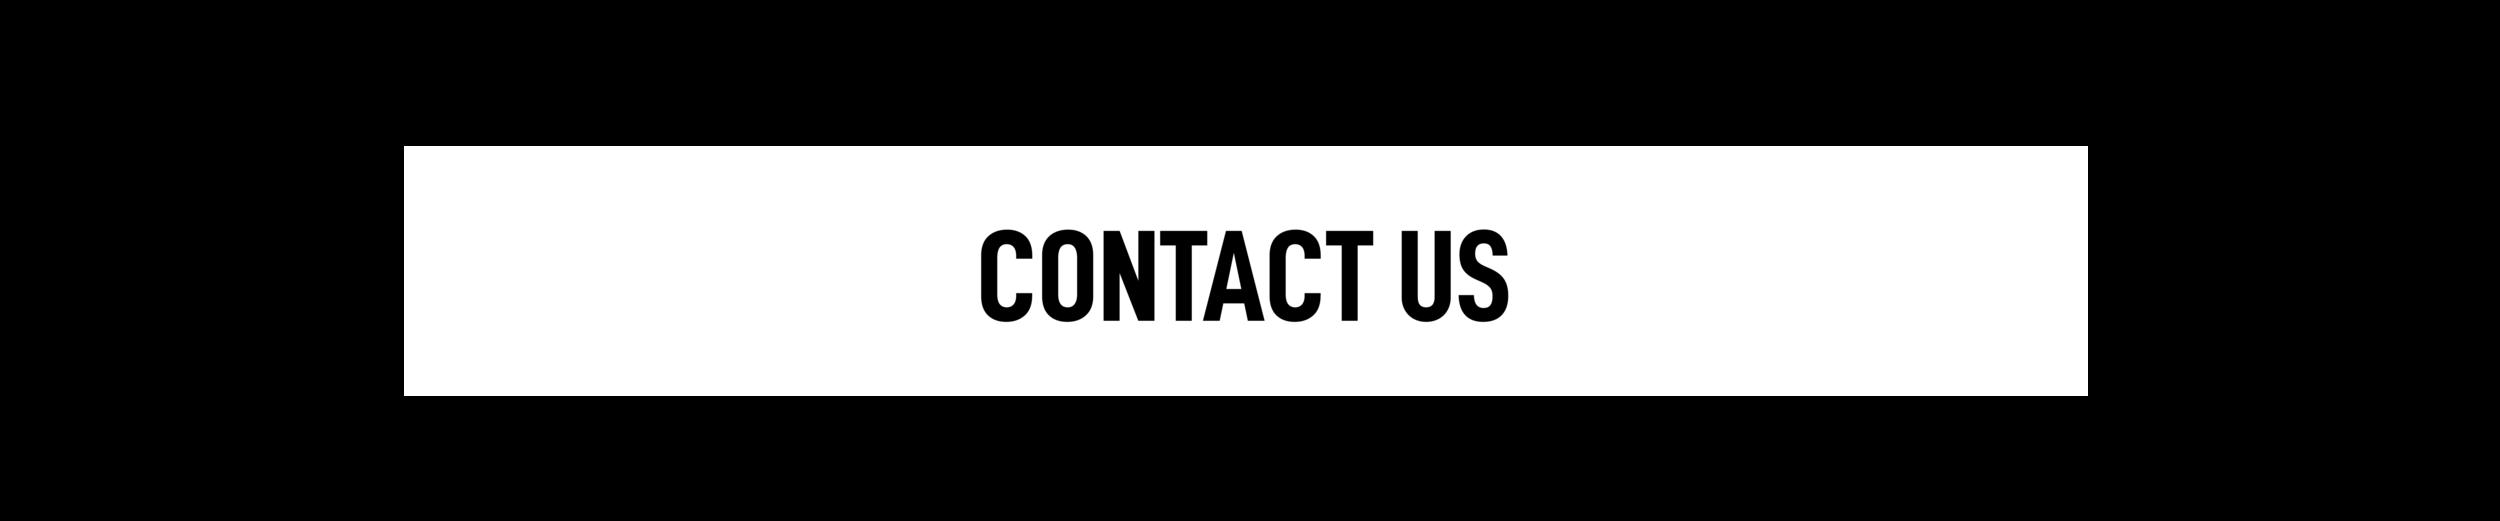 Contact Us Header-01.png